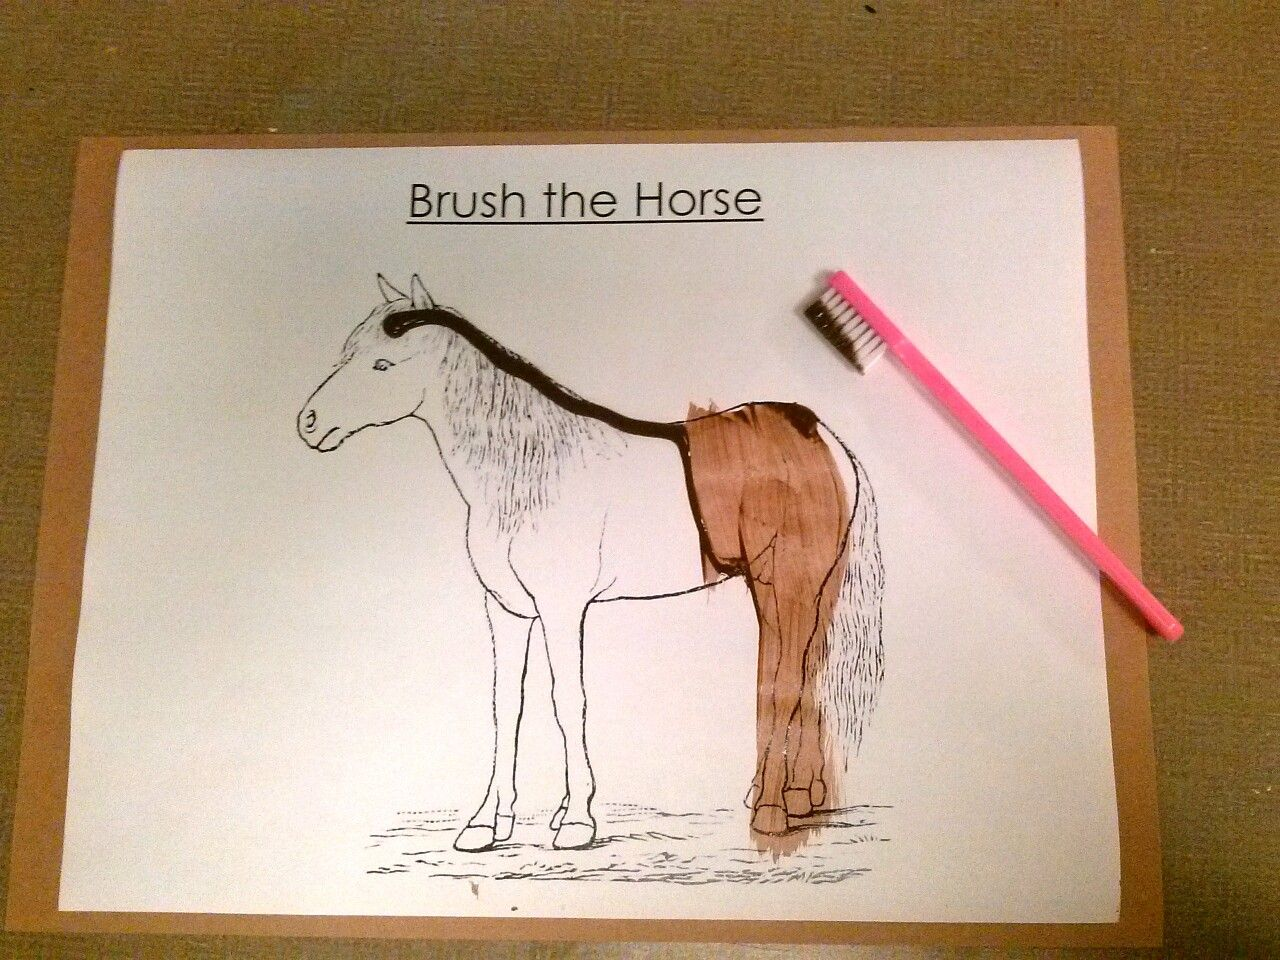 Horse arts and crafts - Preschool Farm Animals Theme Brush The Horse Art Activity